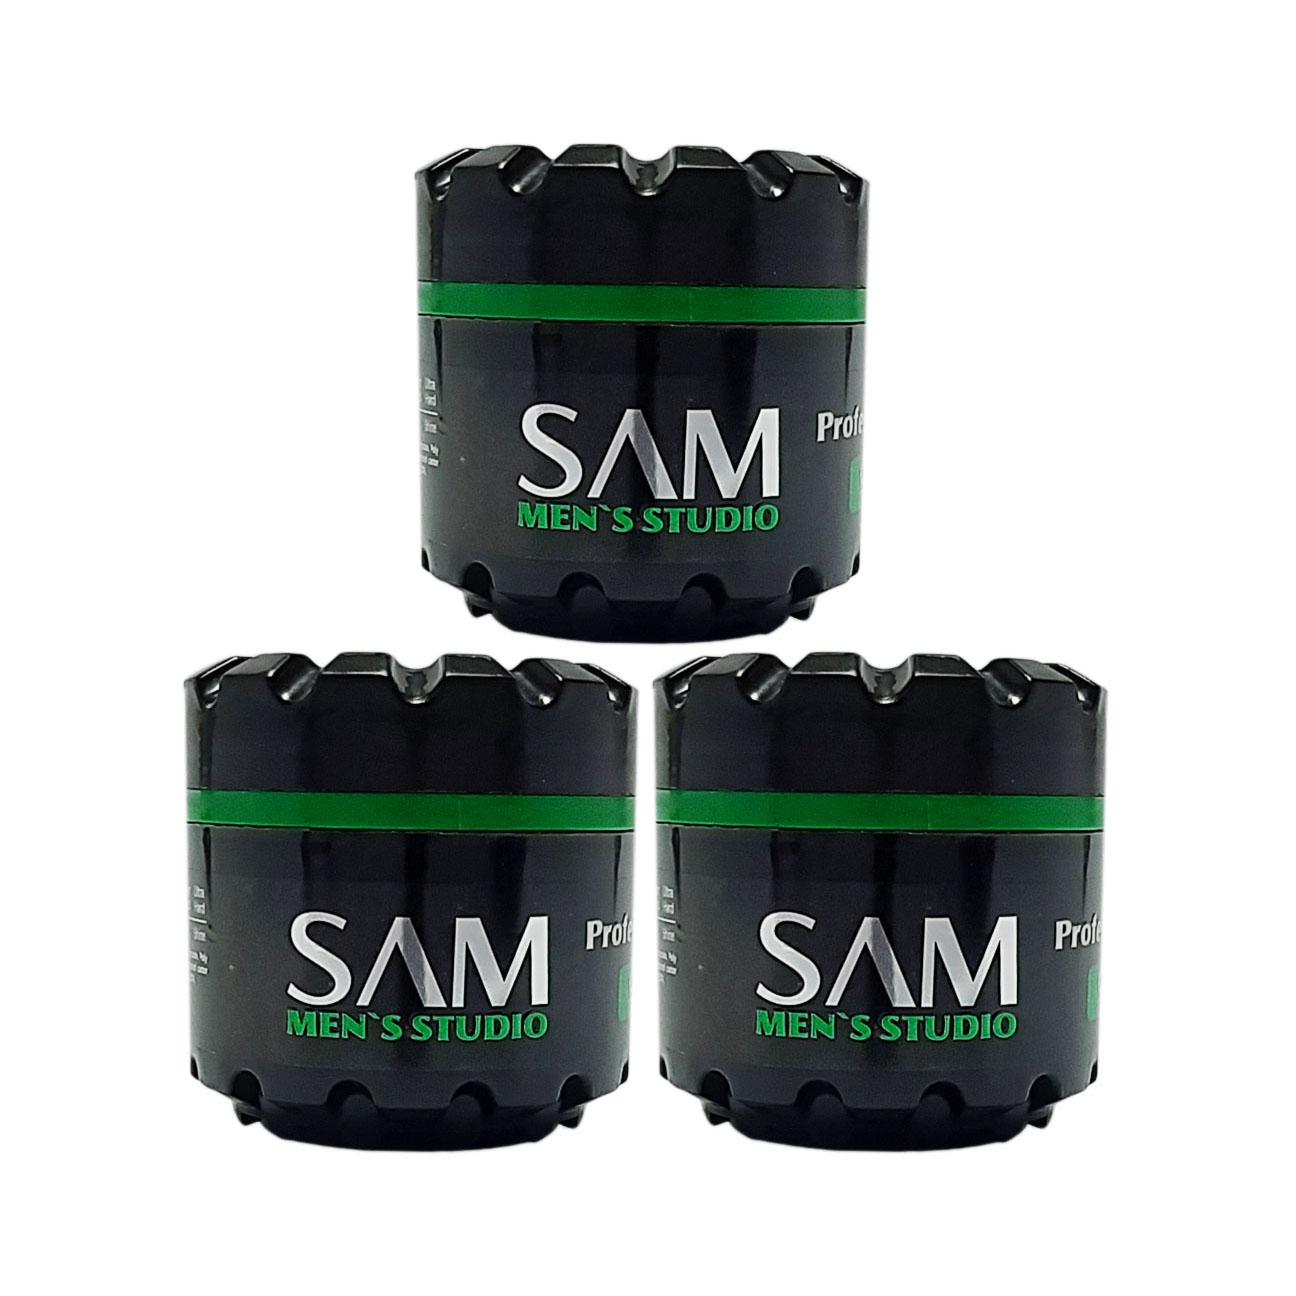 واکس مو سام مدل Olive Oil حجم 140 میلی لیتر مجموعه ۳ عددی